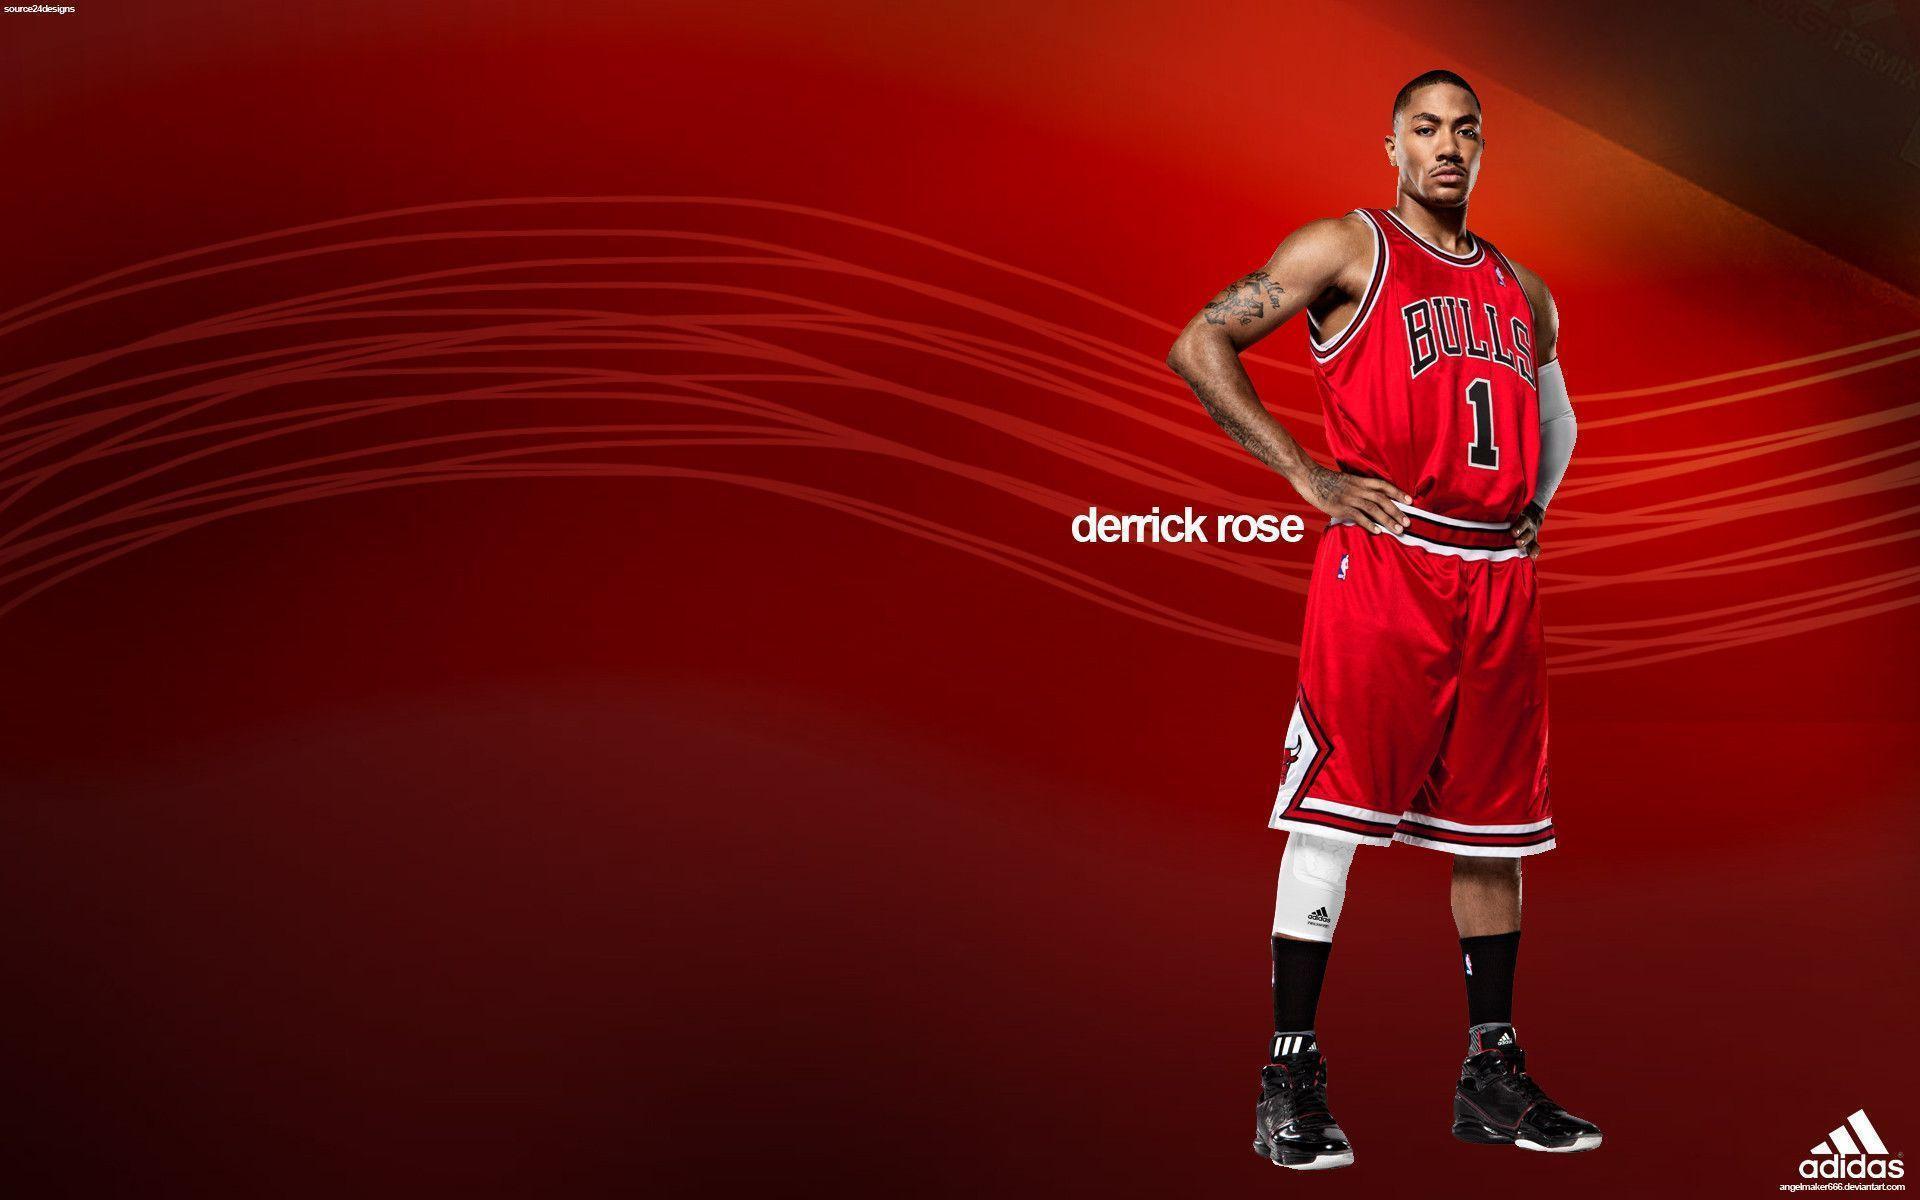 1ed676e21f5 Chicago Bulls Derrick Rose 54 100196 Images HD Wallpapers